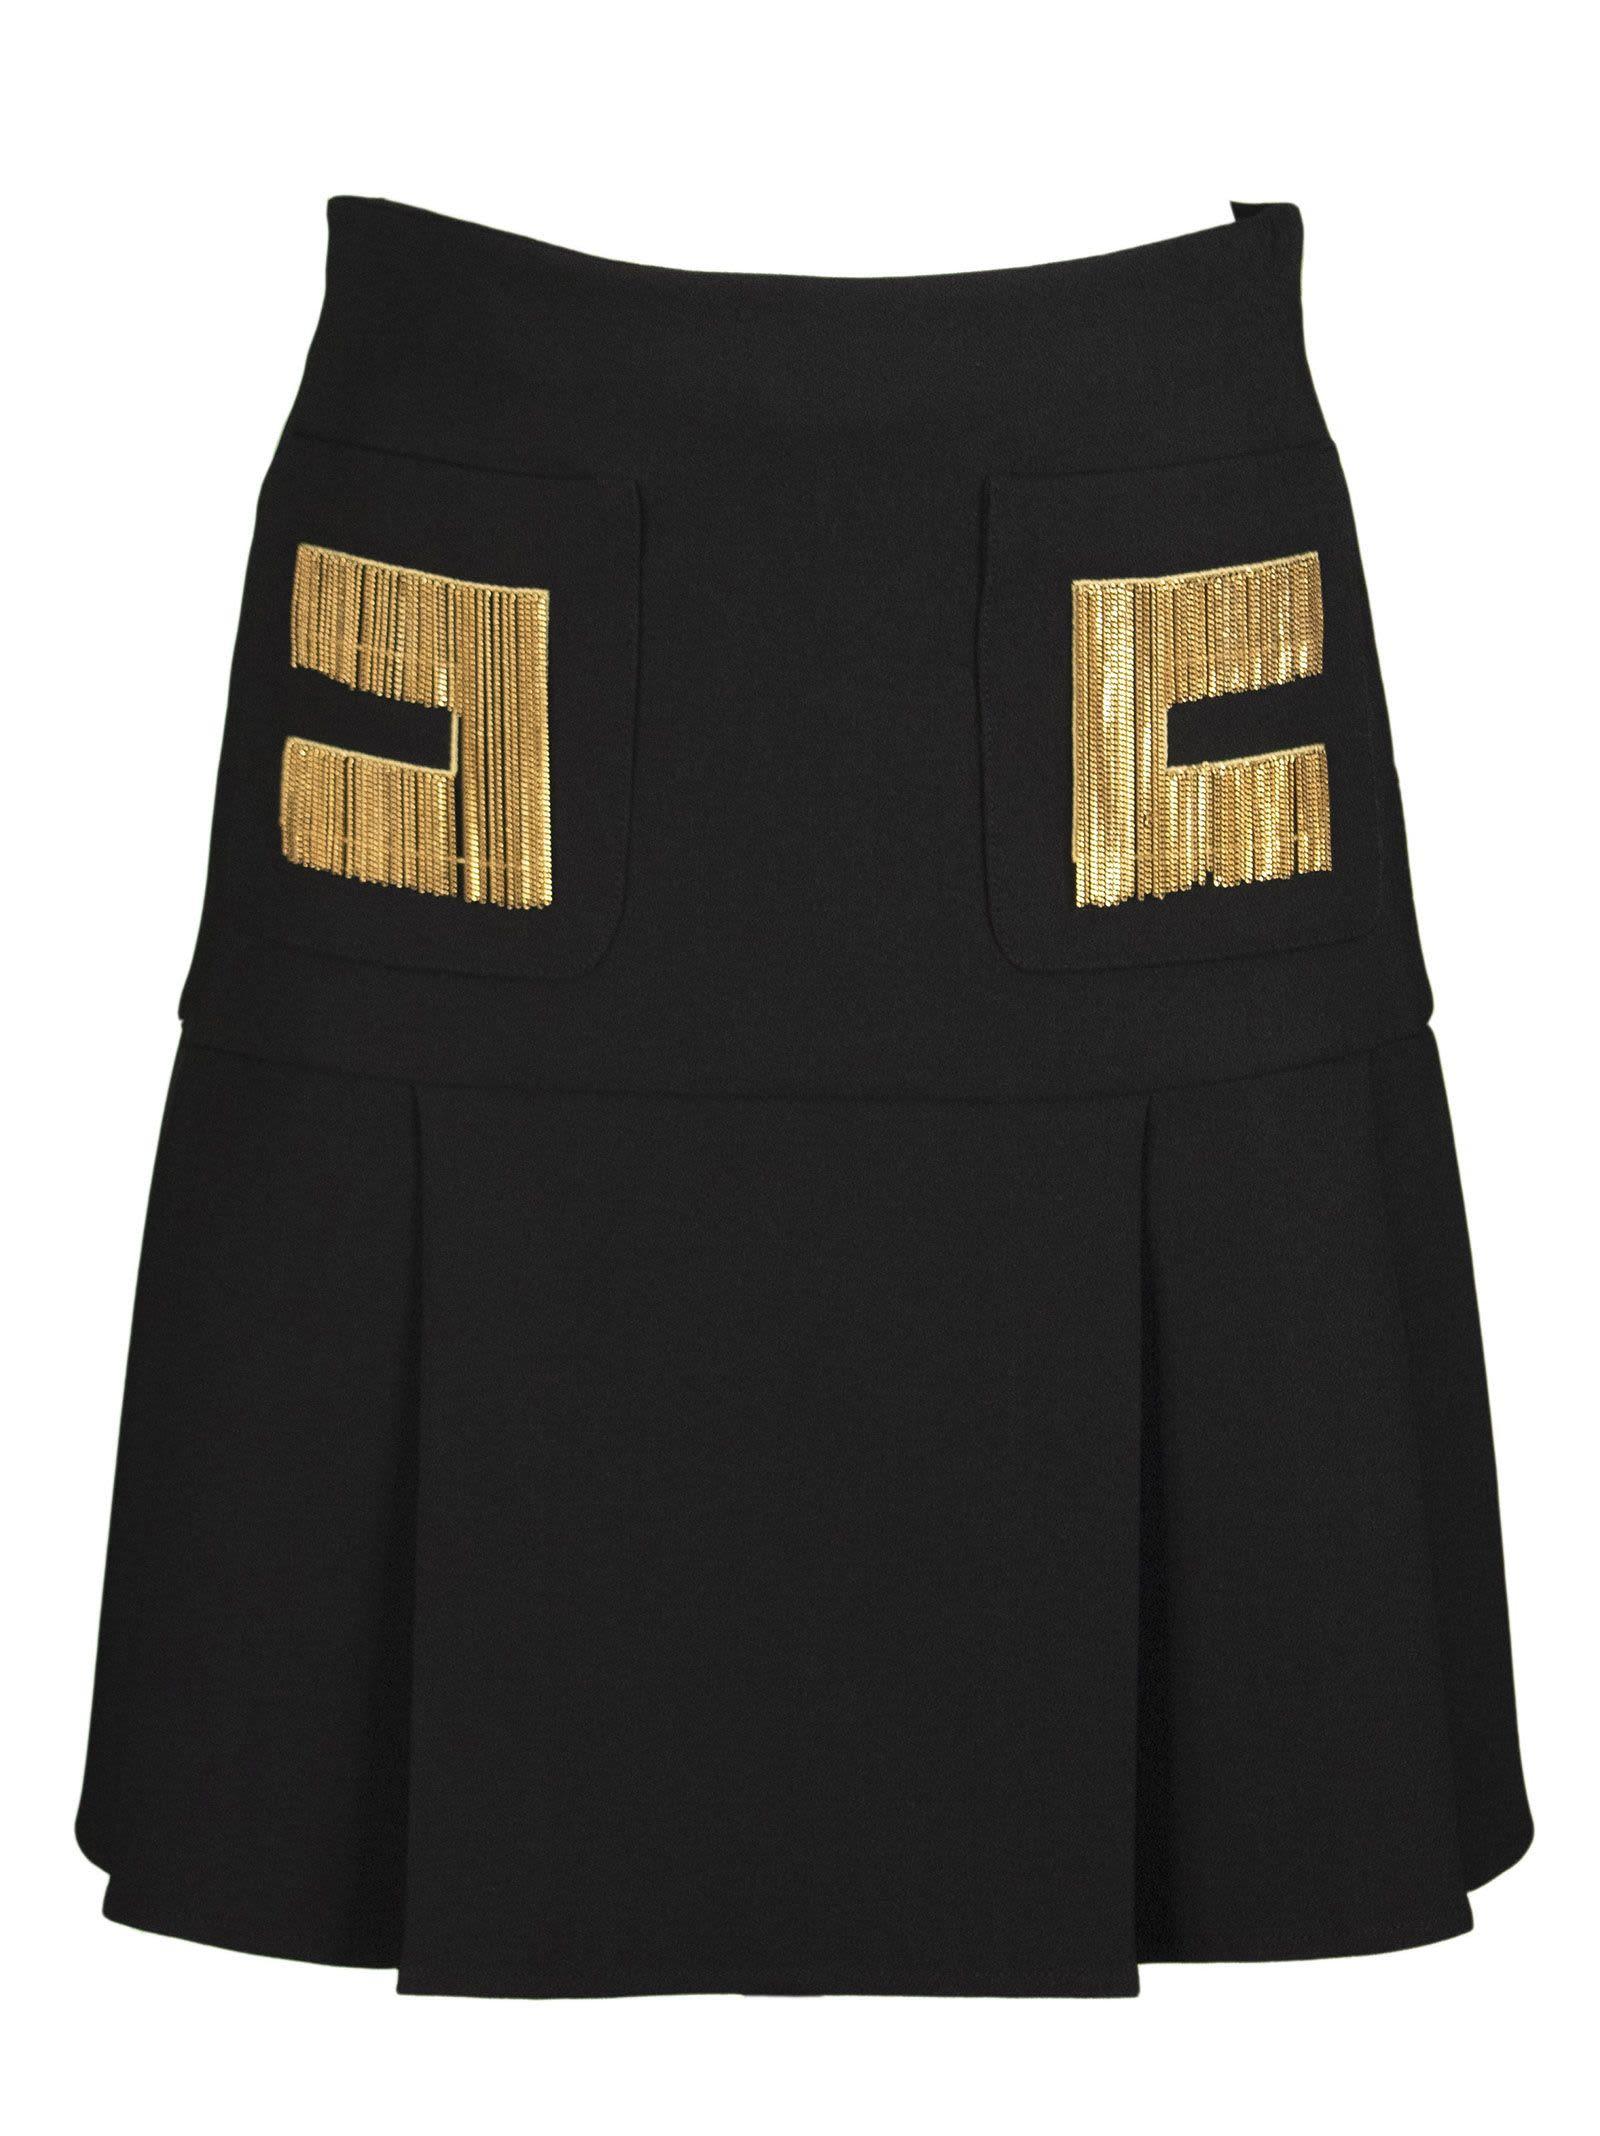 Elisabetta Franchi Celyn B. Pleated skirts PLEATED SKIRT WITH LOGO